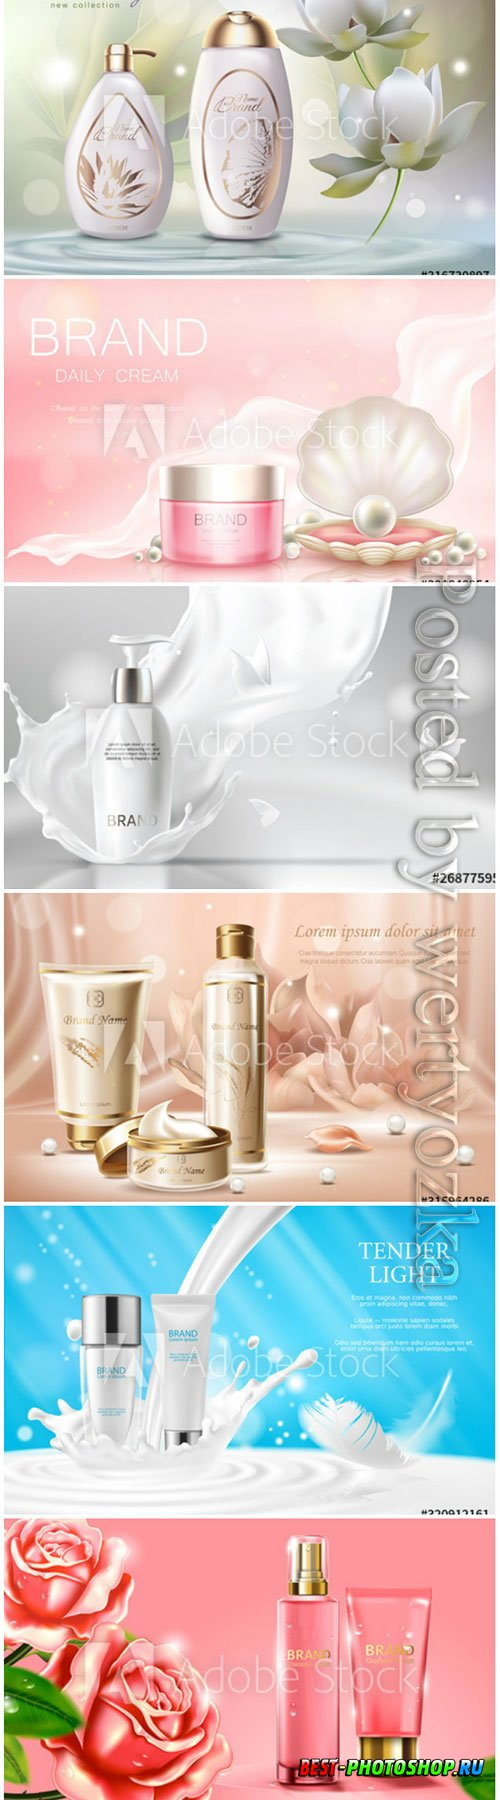 Cosmetics advertising banner vector template